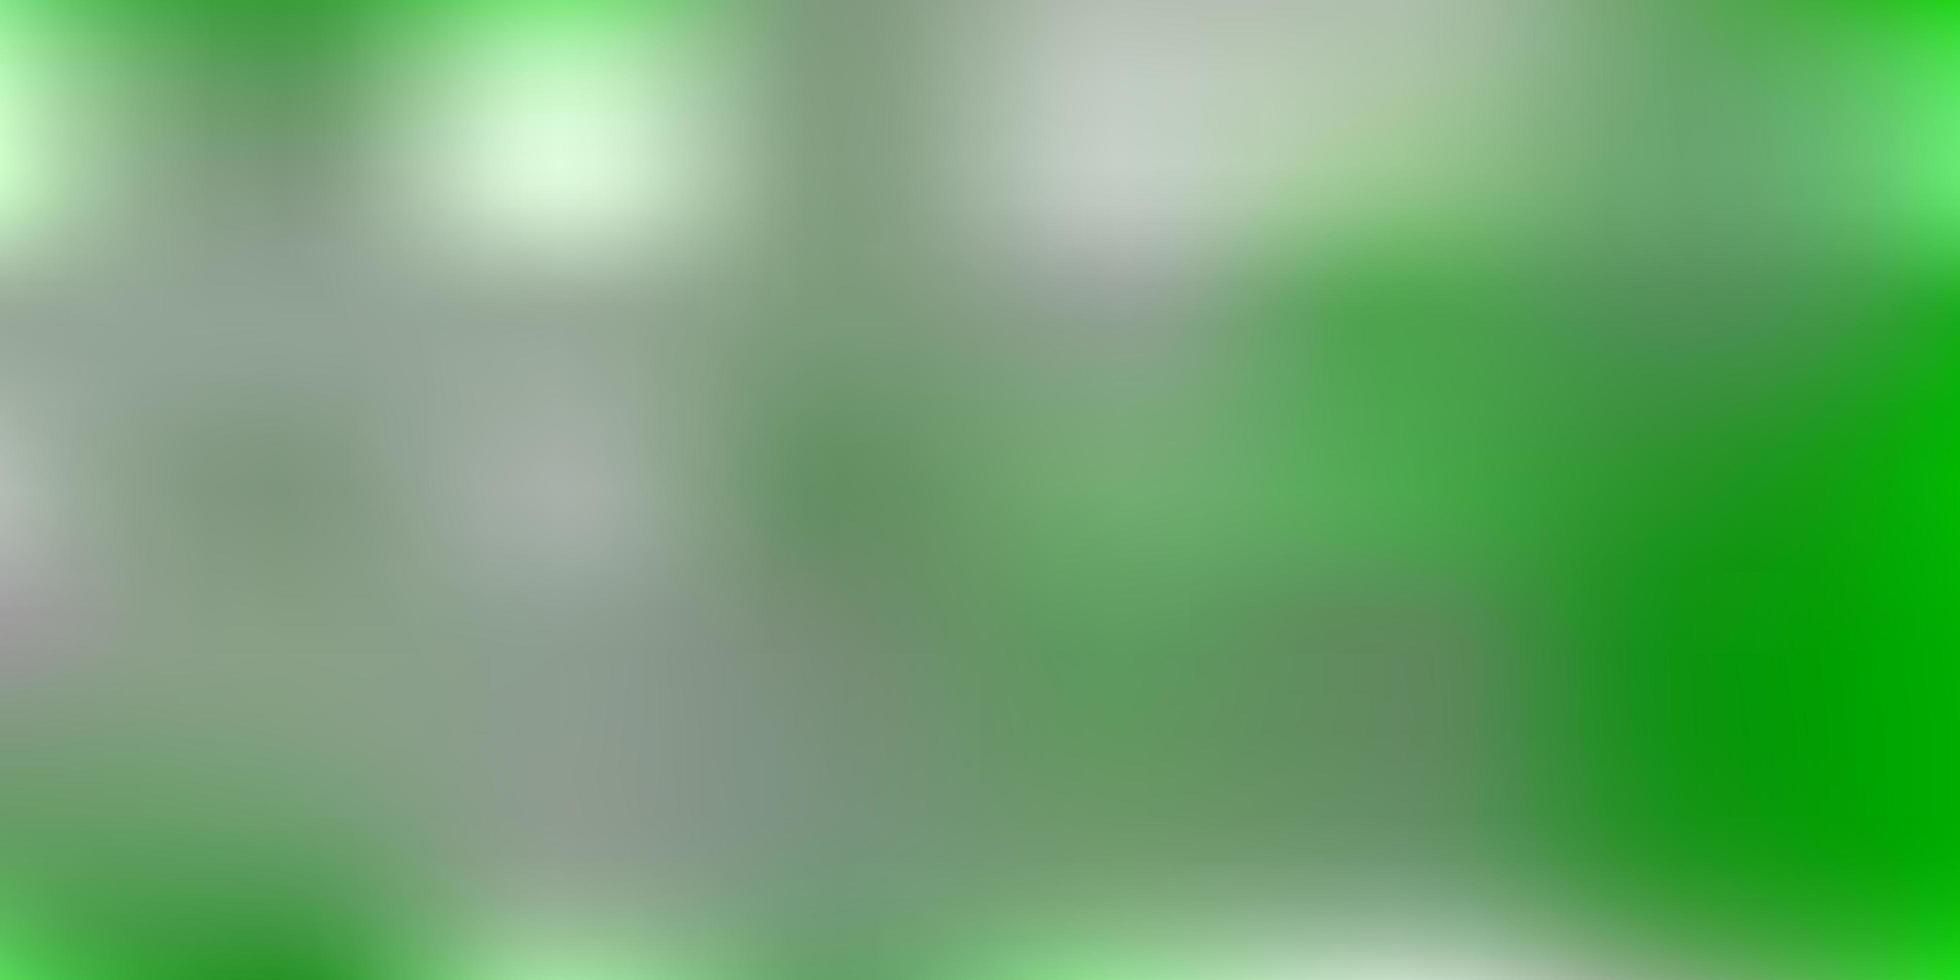 hellgrüne Vektor-Gradienten-Unschärfe-Textur. vektor